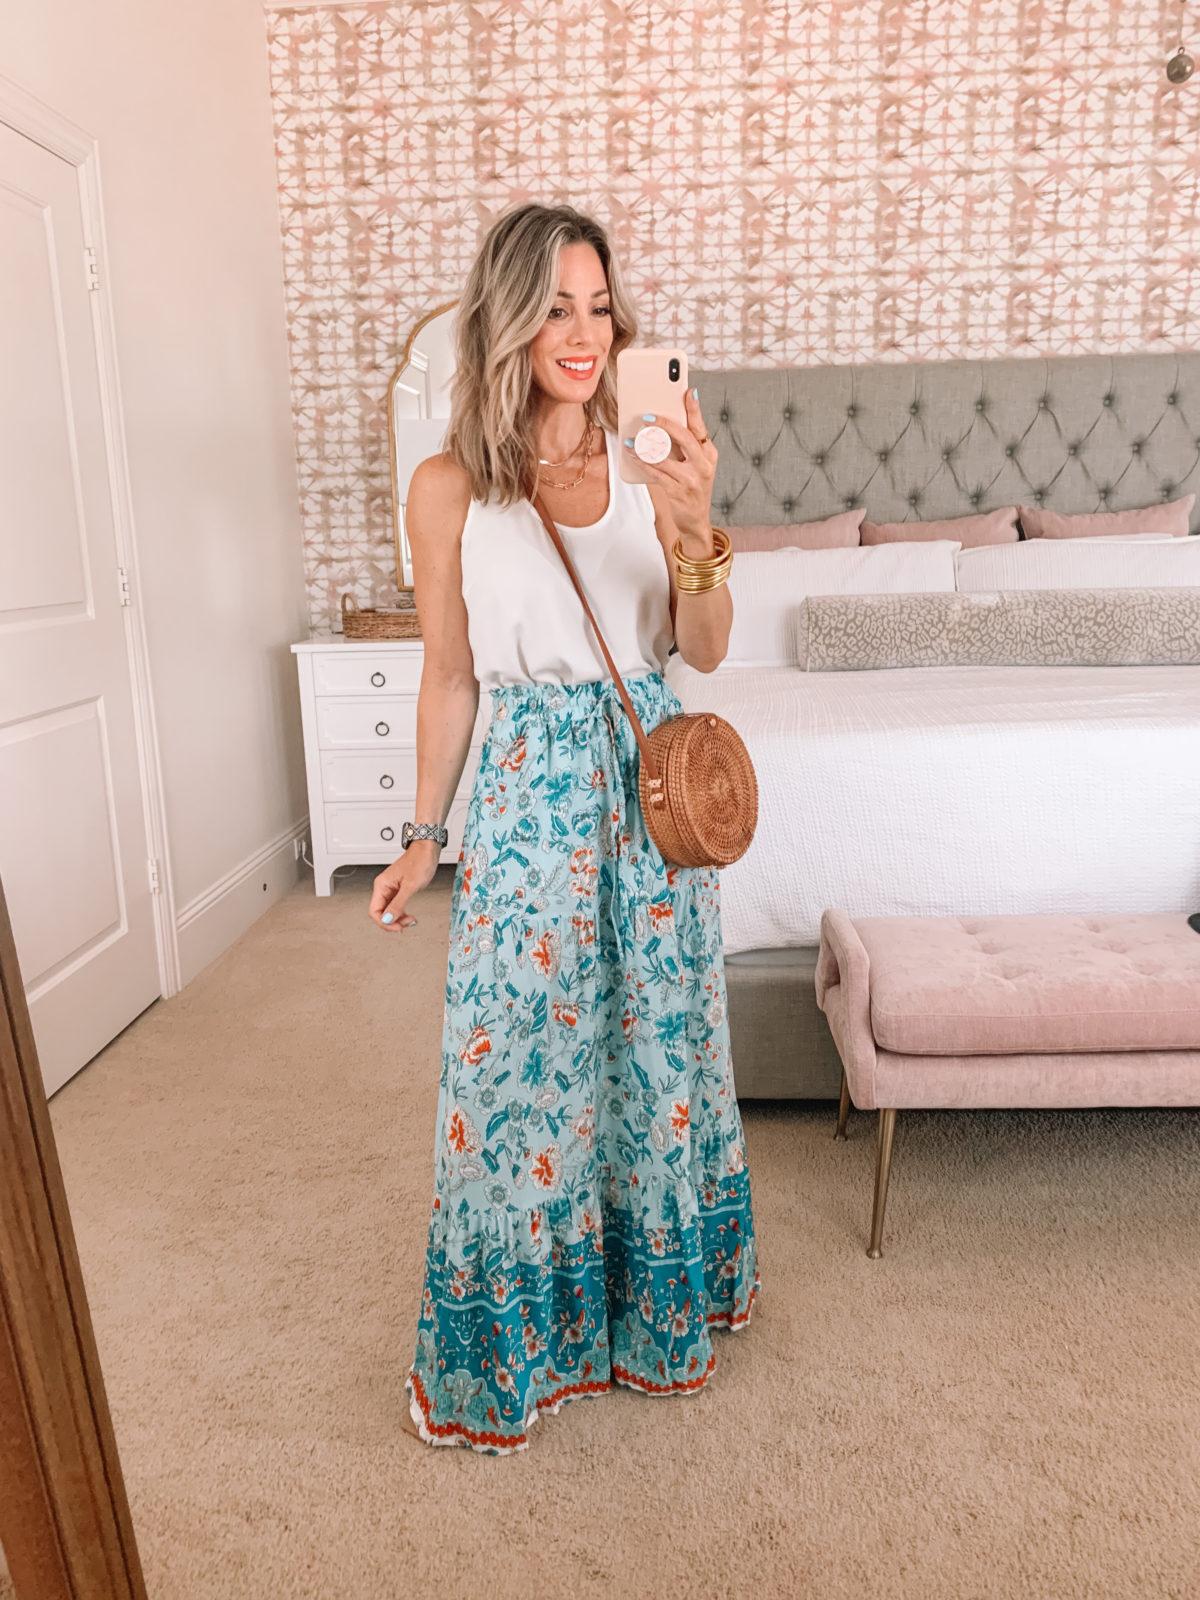 Amazon Fashion Faves, White Tank, Floral Maxi Skirt, Crossbody Bag